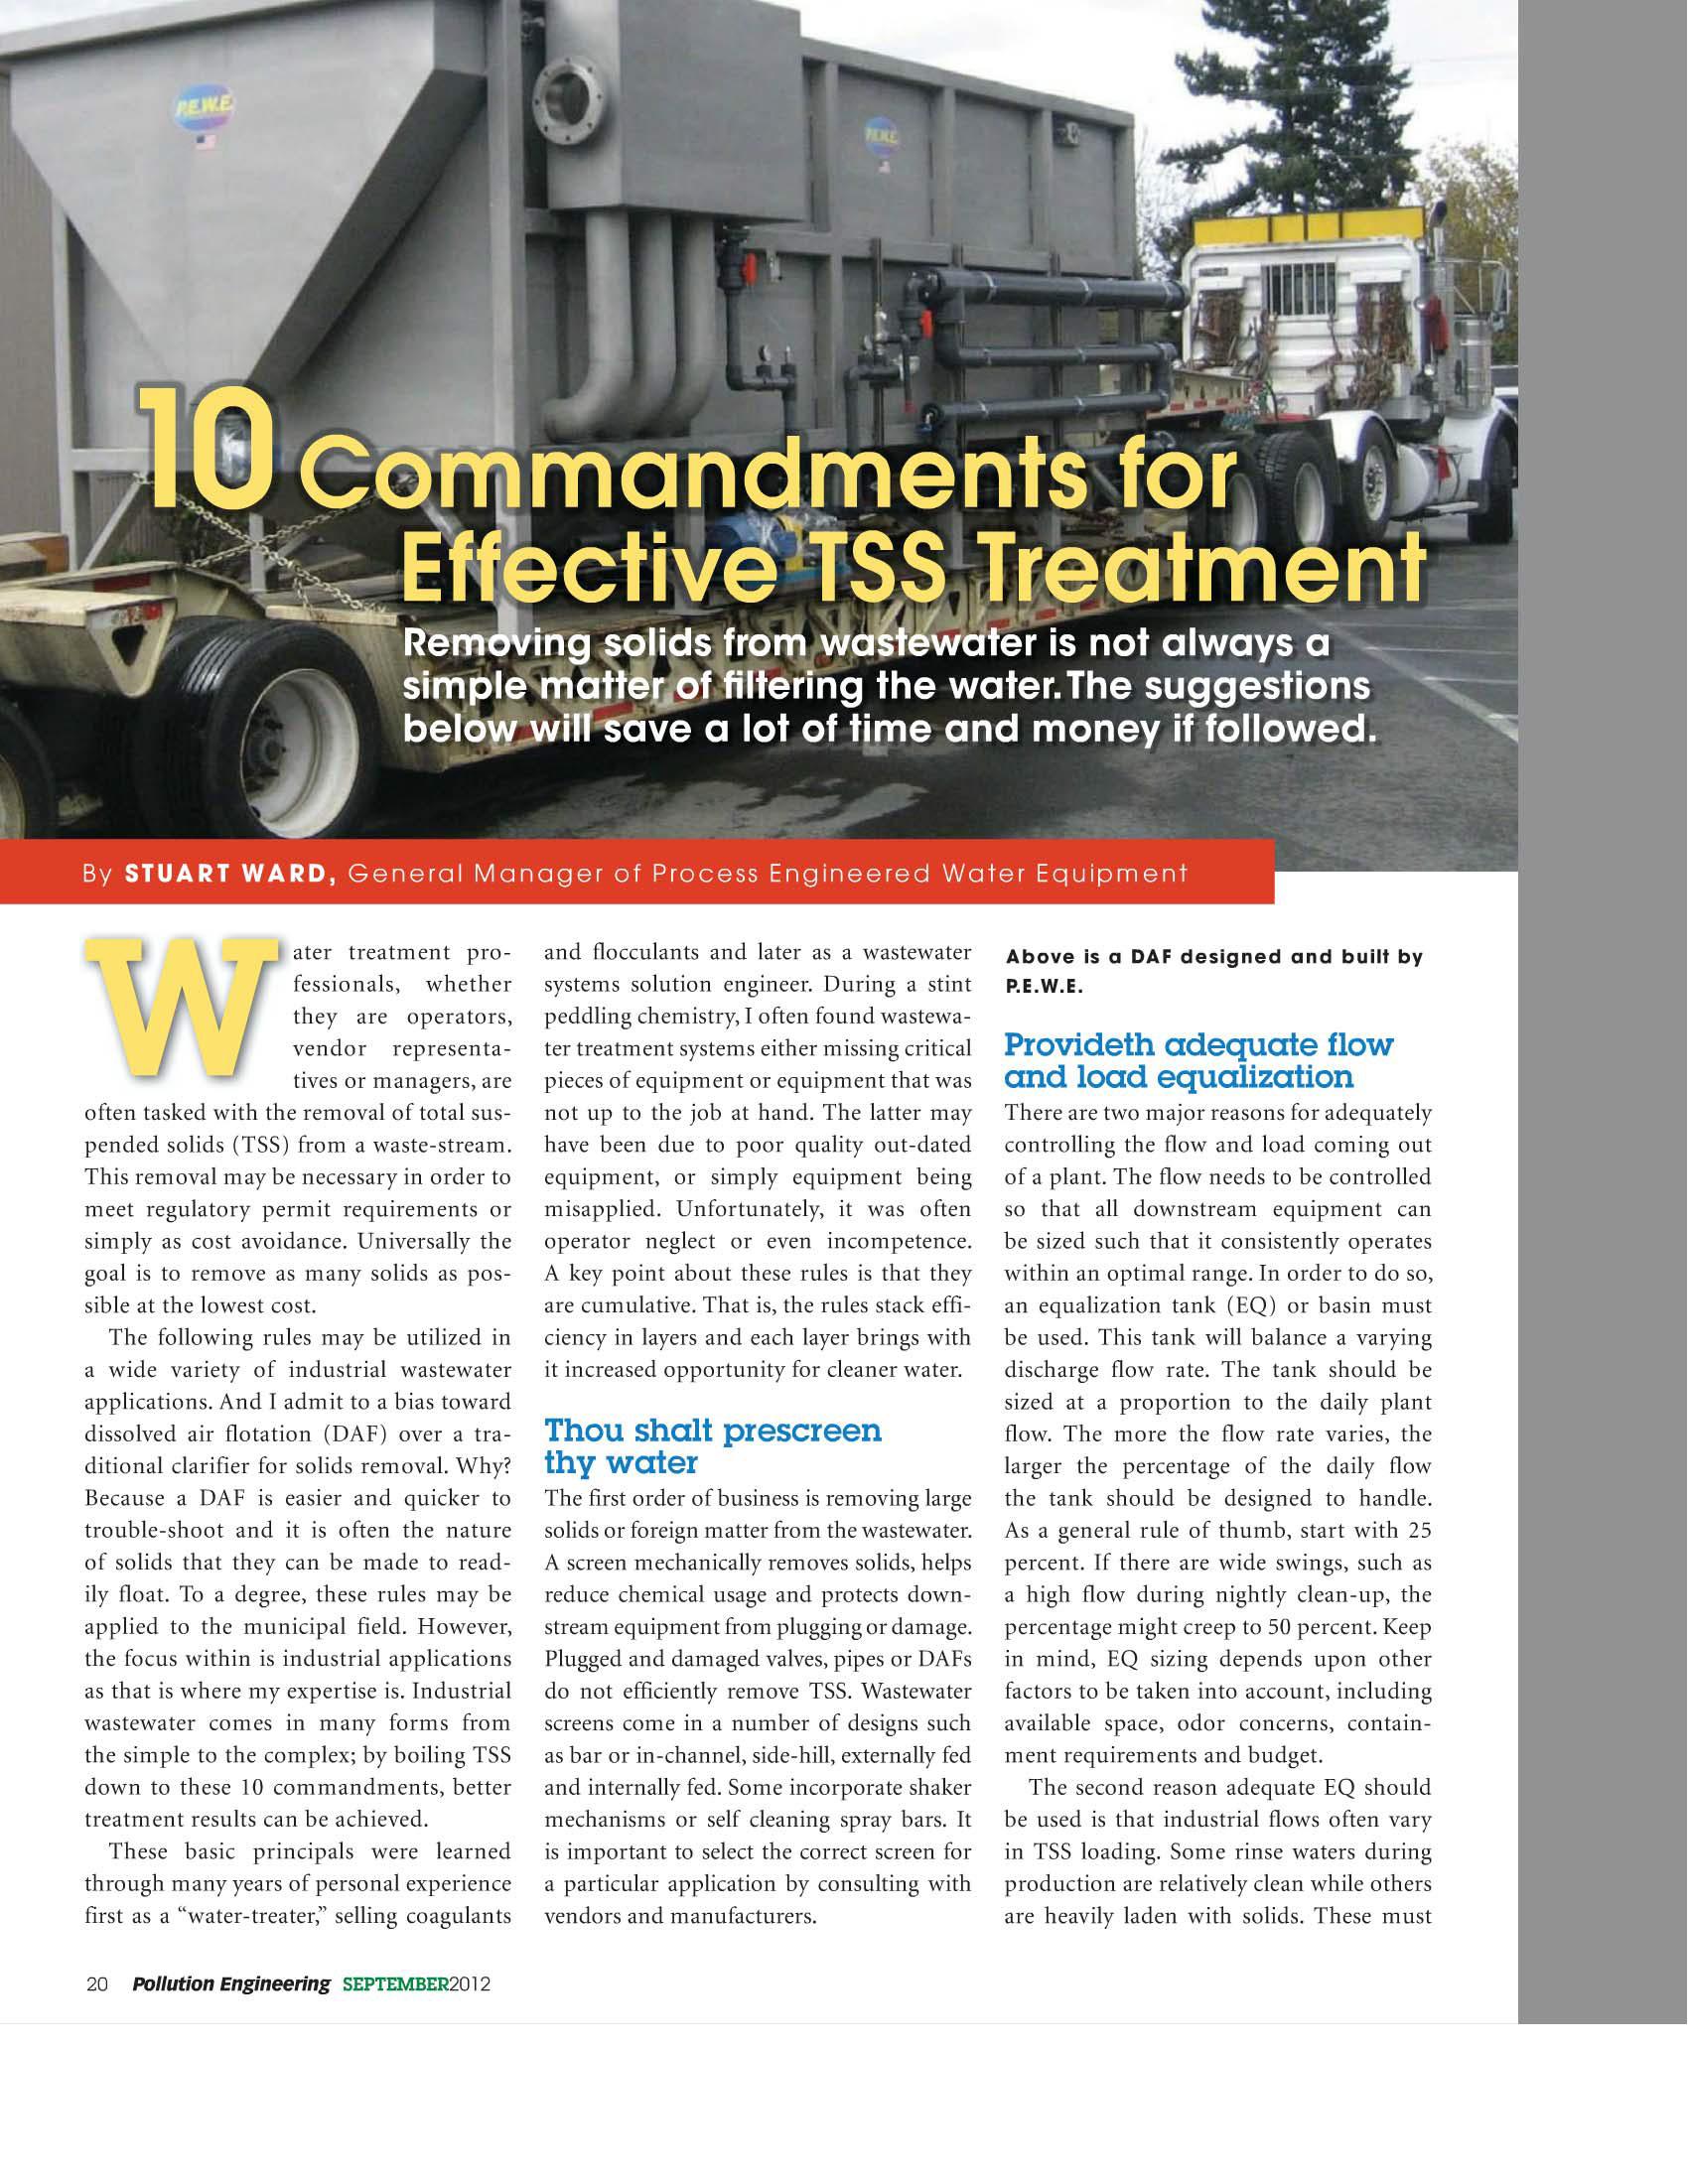 10 Commandments for Effective TSS Treatment .pdf file